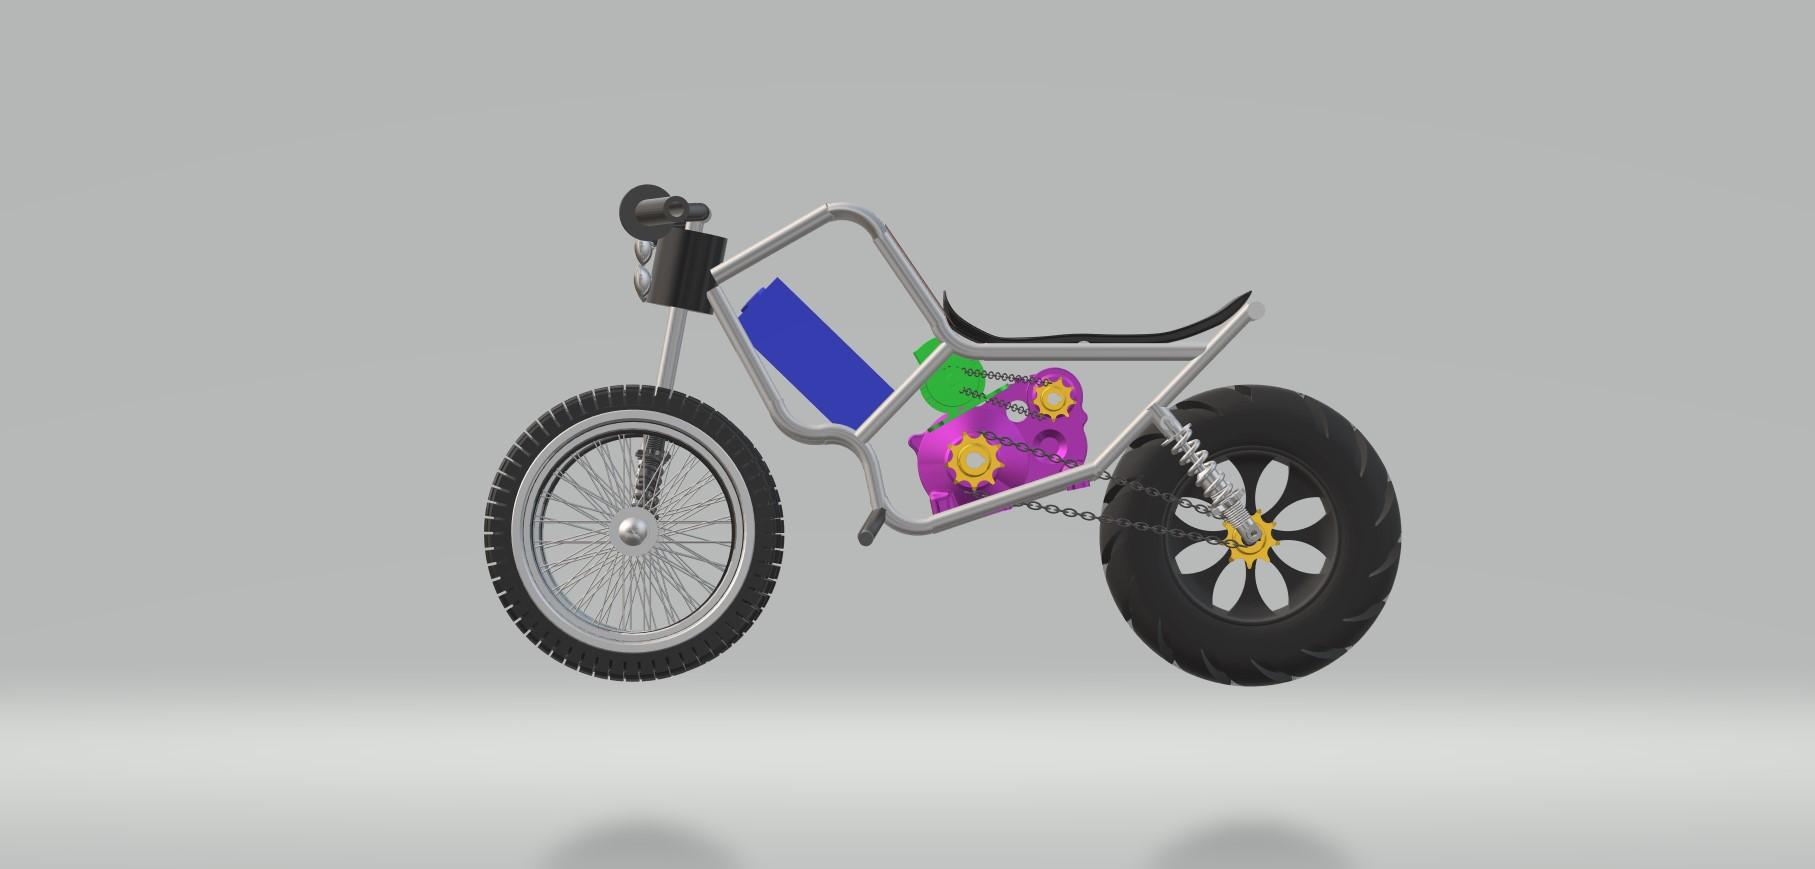 Nevon 3 wheel bike side view